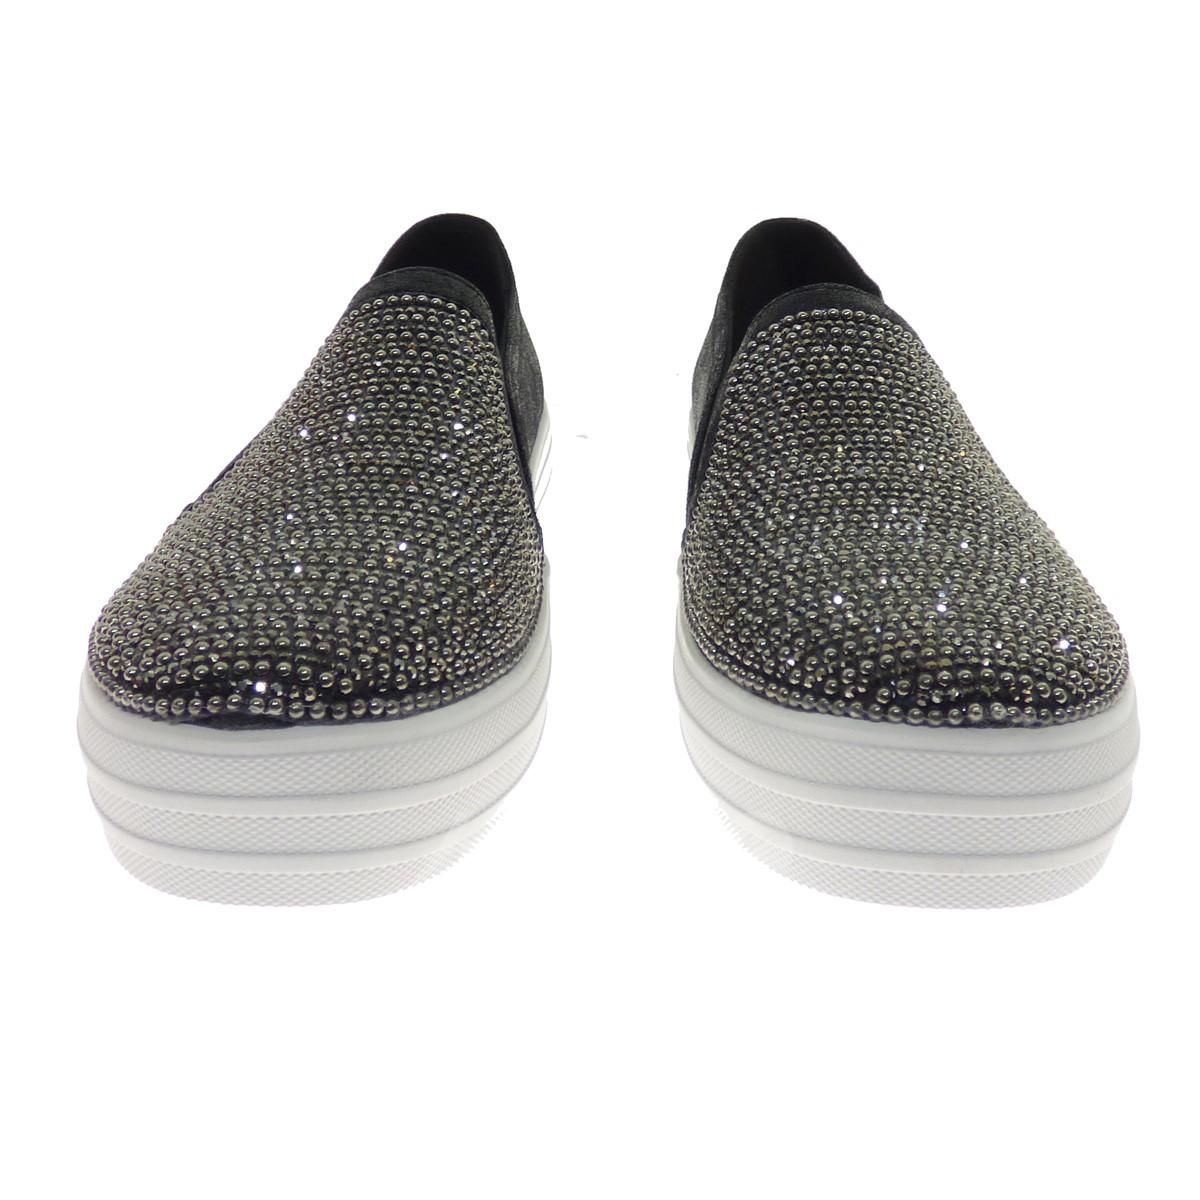 SKECHERS Double Up Shiny Dancer black size: 25 (スケッチャーズ)